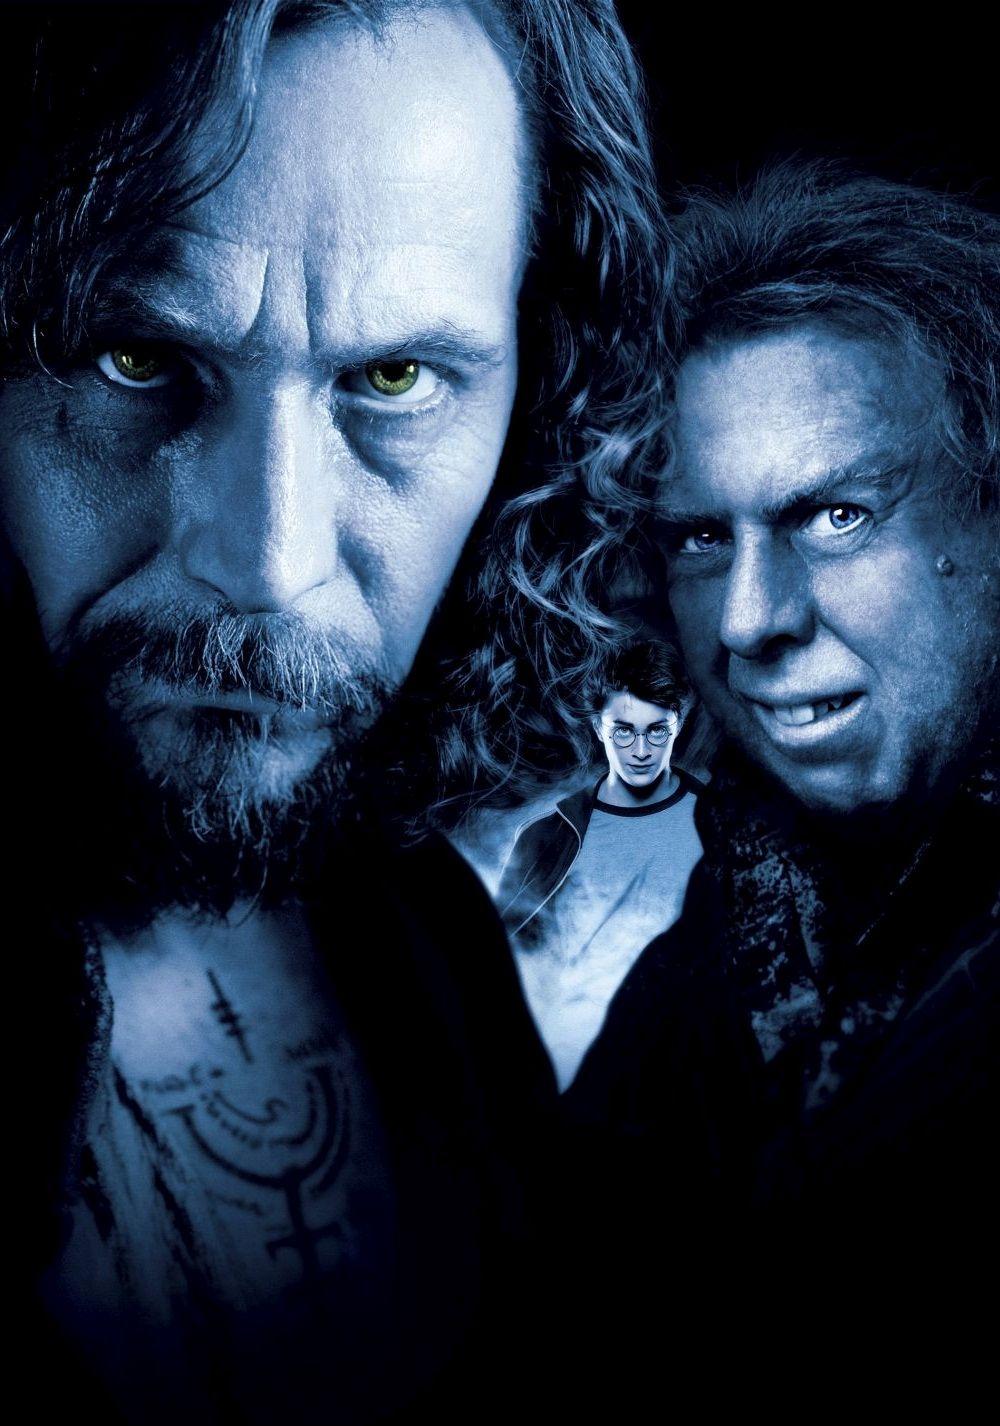 prisoner of azkaban movie download